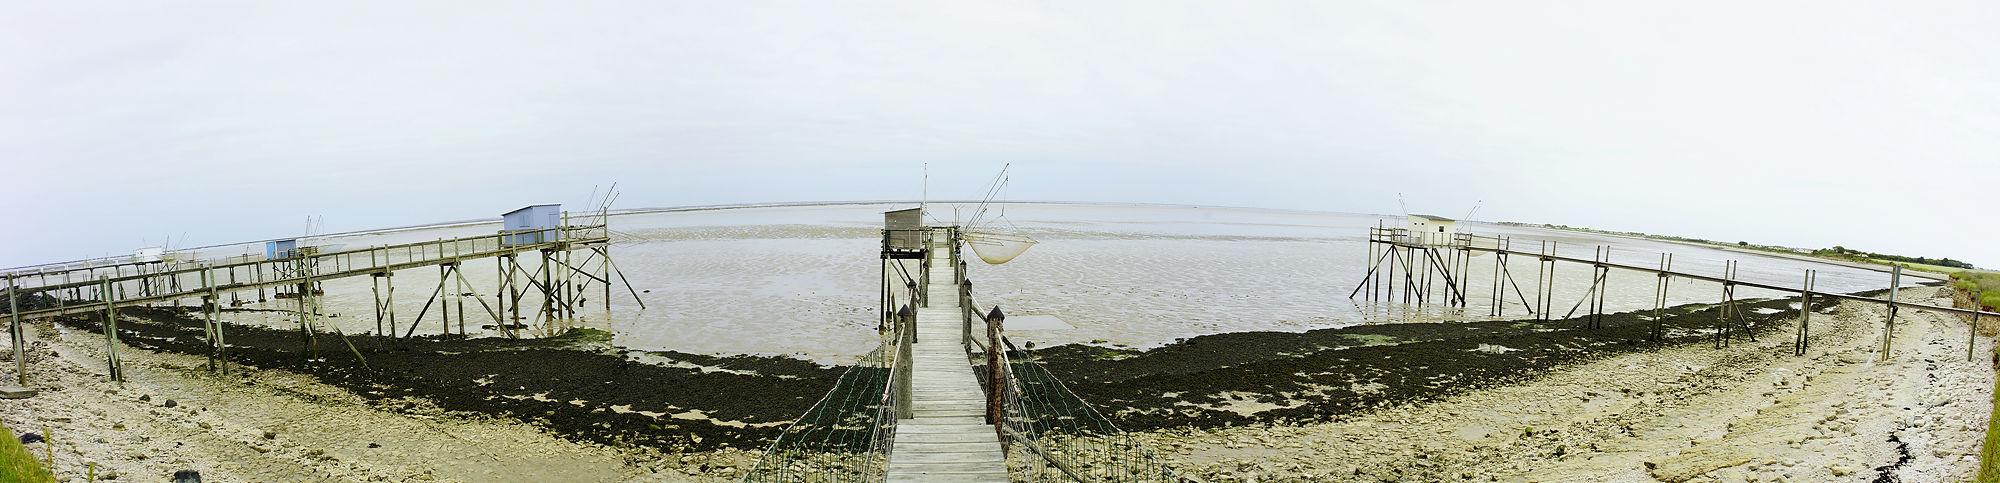 * Carrelets an der Baie de Aiguillon *